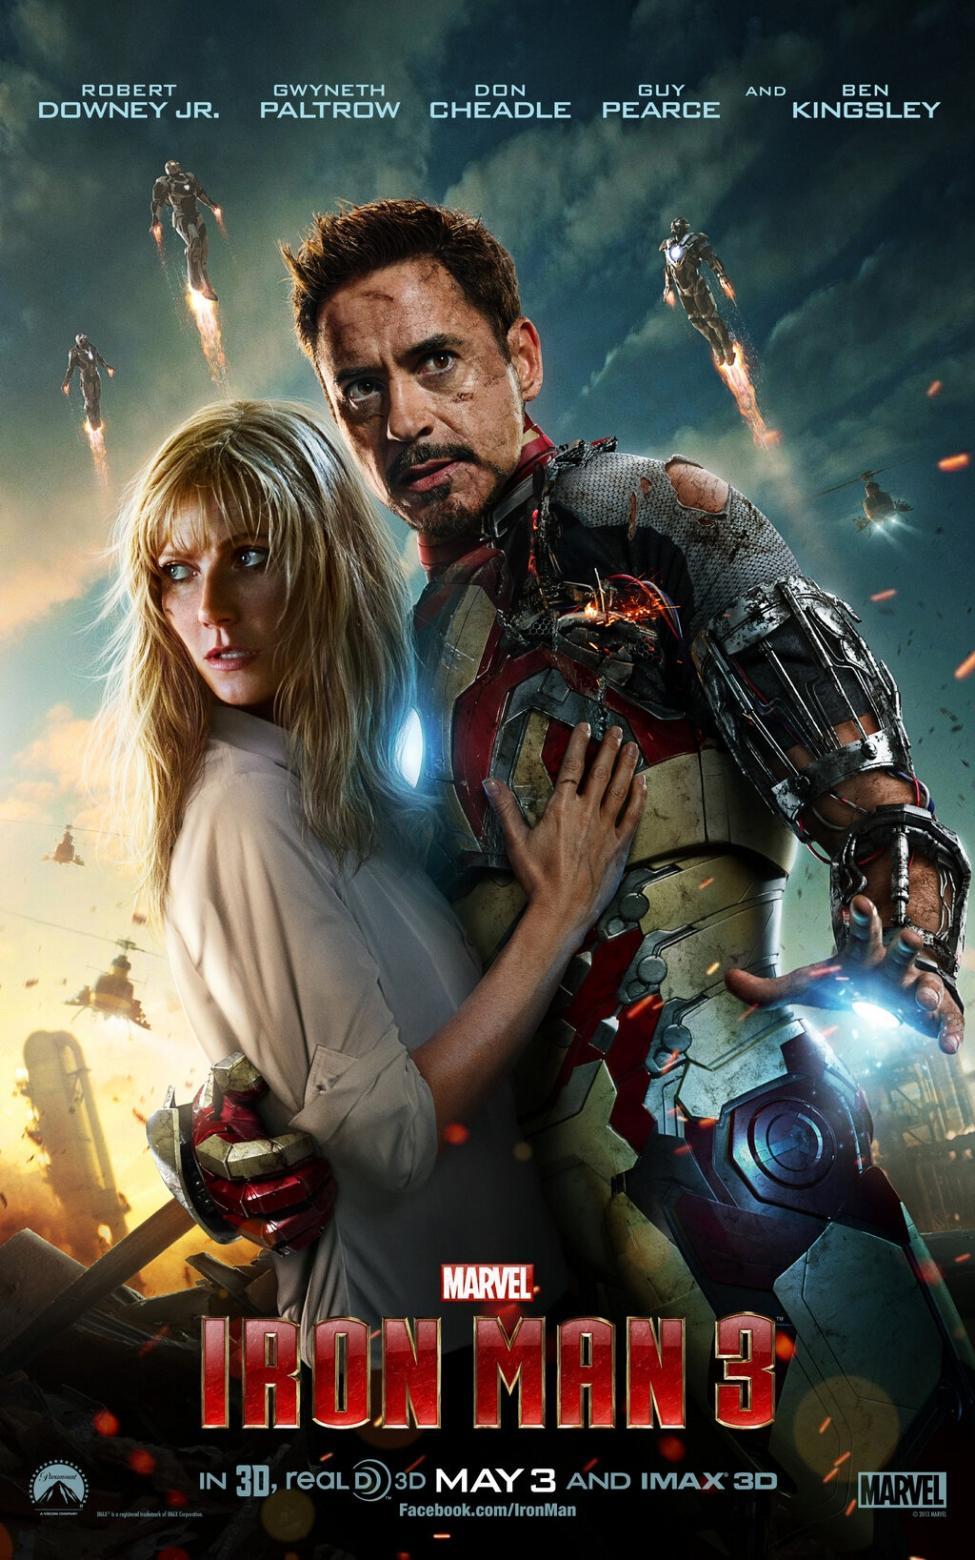 image - iron man 3 poster 3 | marvel cinematic universe wiki